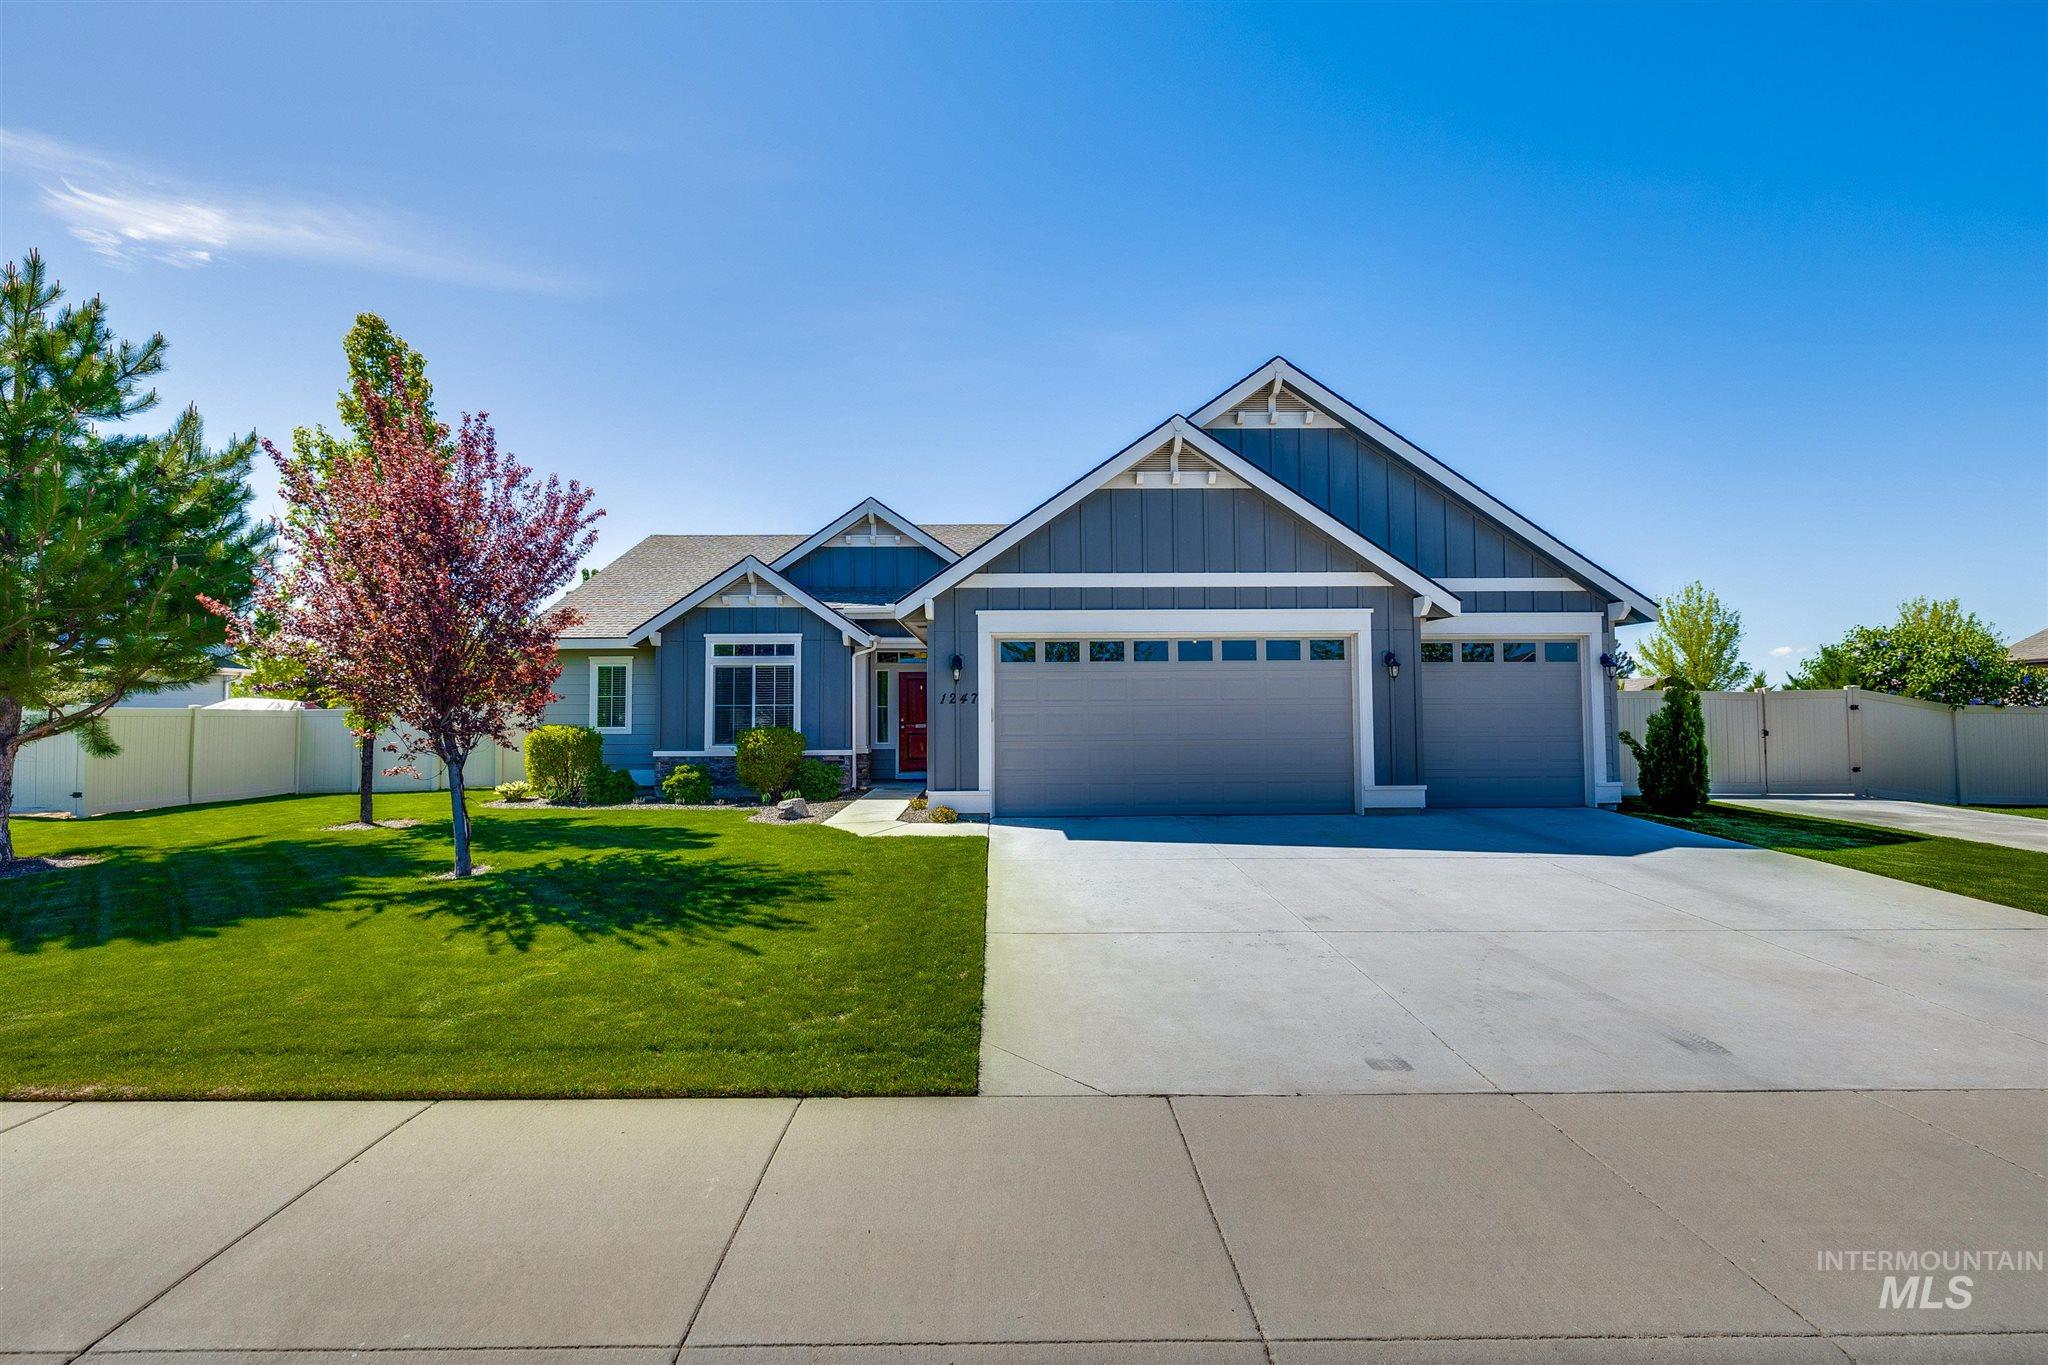 1247 W Caravan St Property Photo - Kuna, ID real estate listing